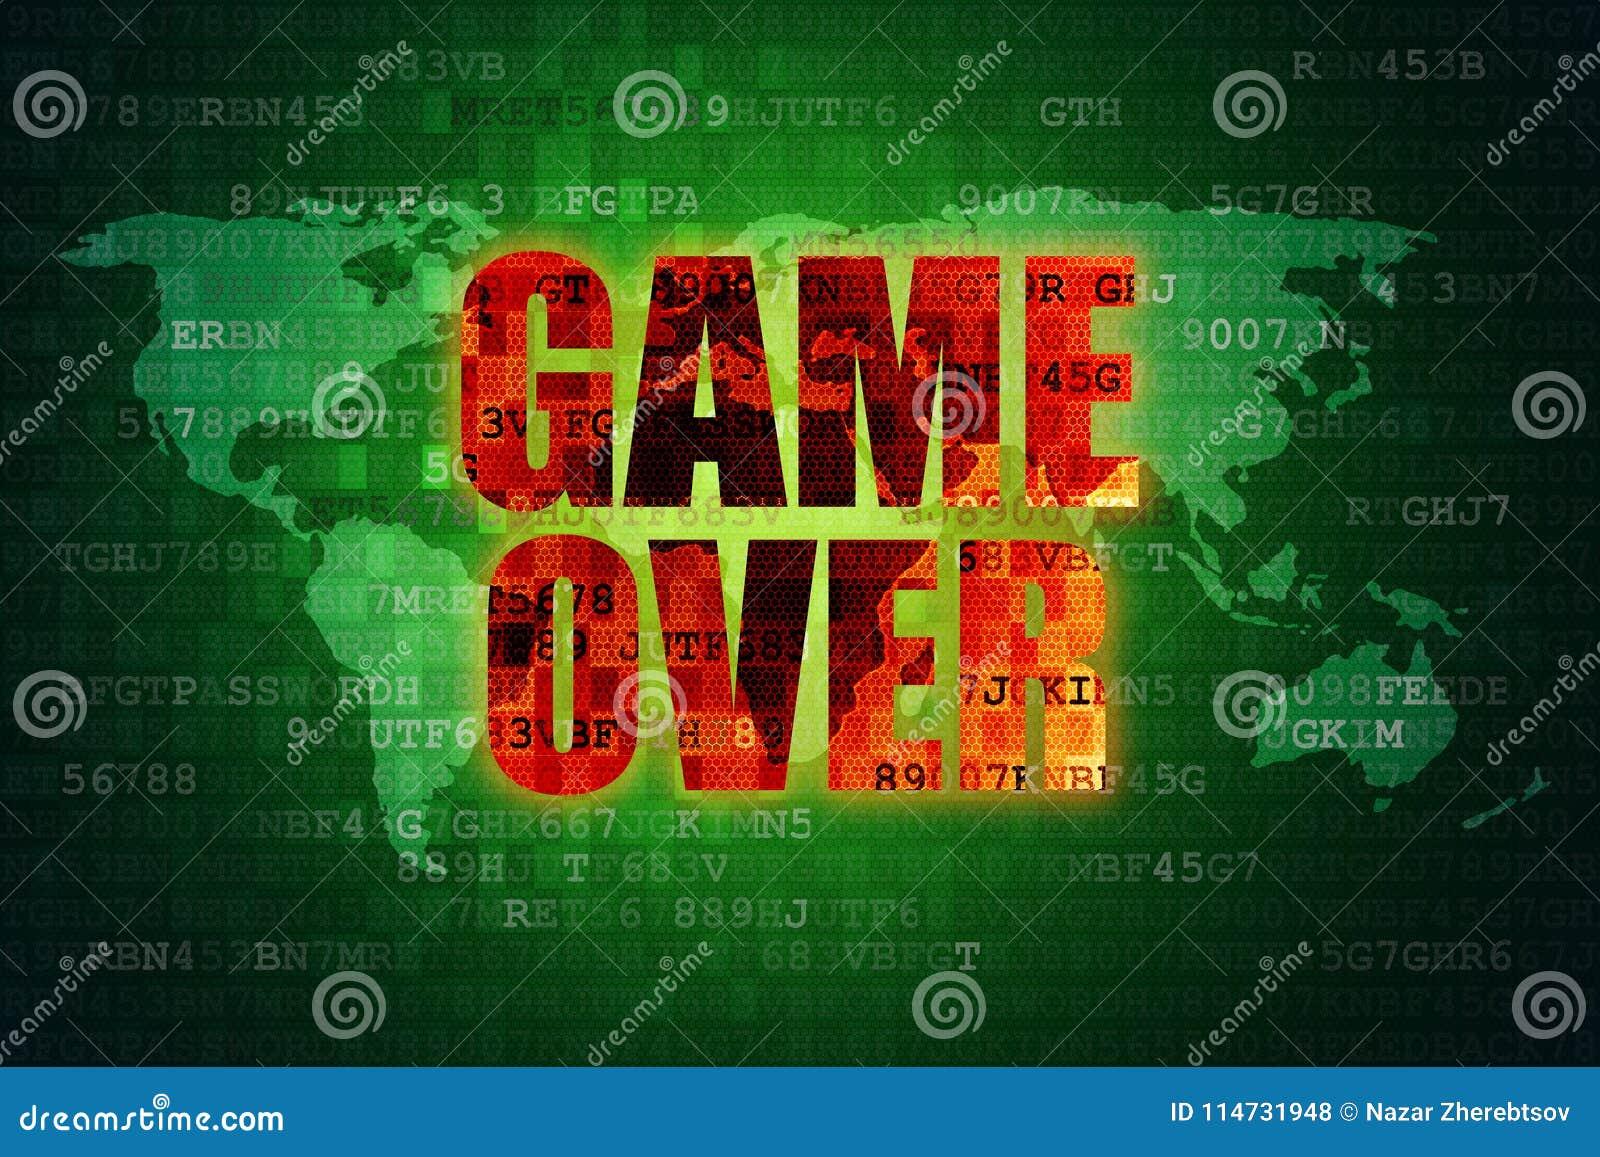 Illustration of pixel red game over screen on green digital world download illustration of pixel red game over screen on green digital world map background stock illustration gumiabroncs Choice Image